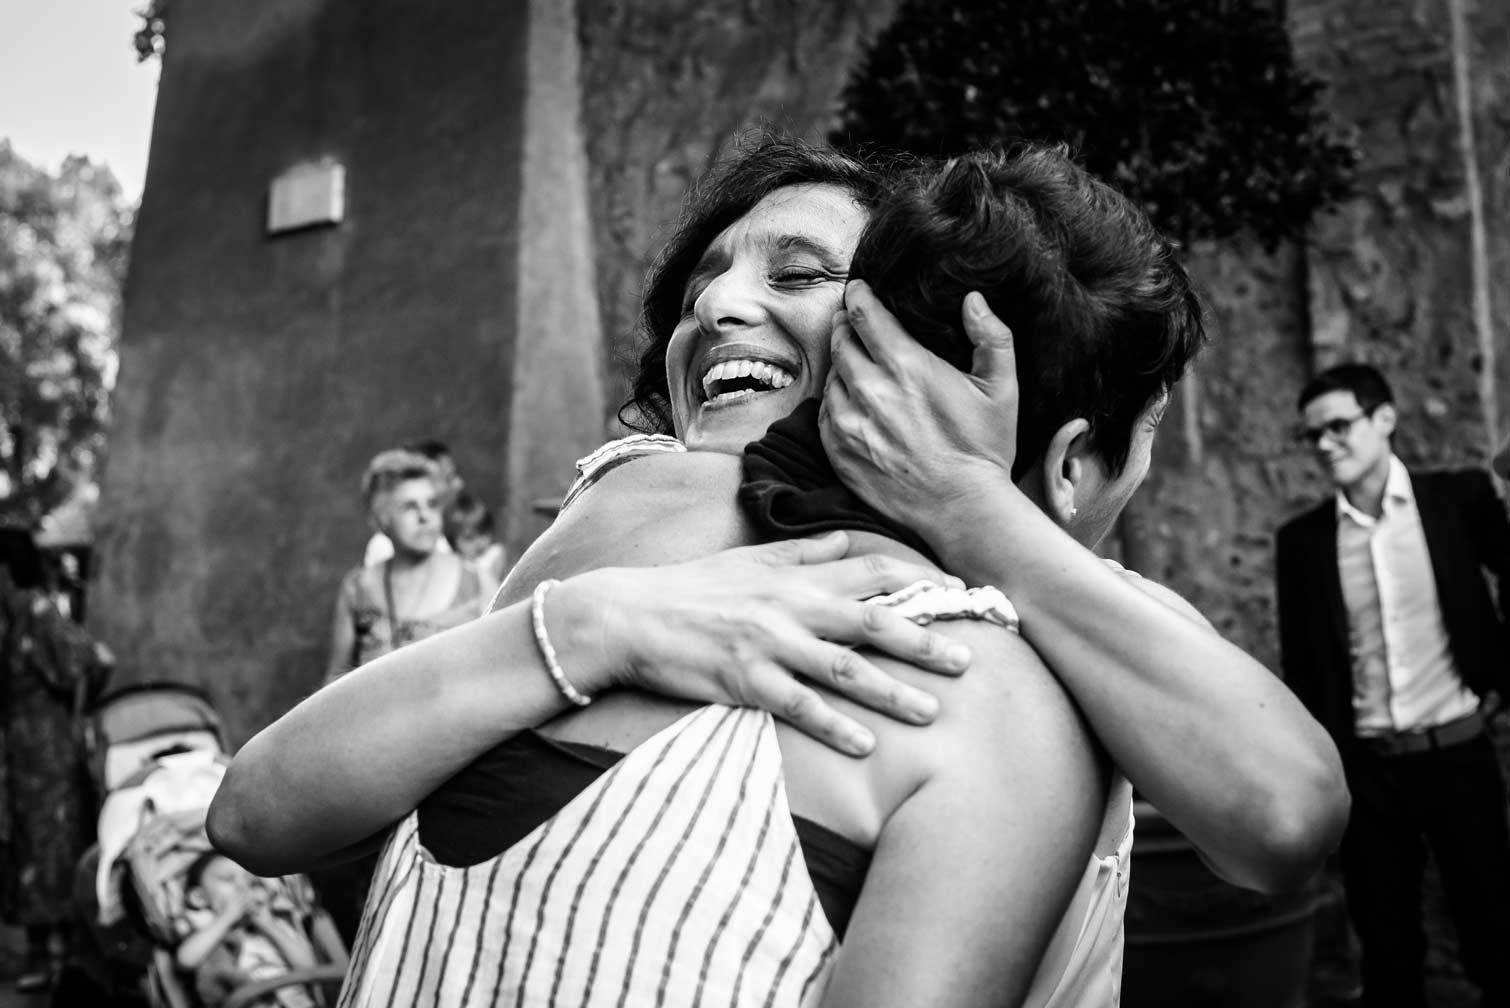 Reportage-Wedding-Photography-Italy-1-Ceremony